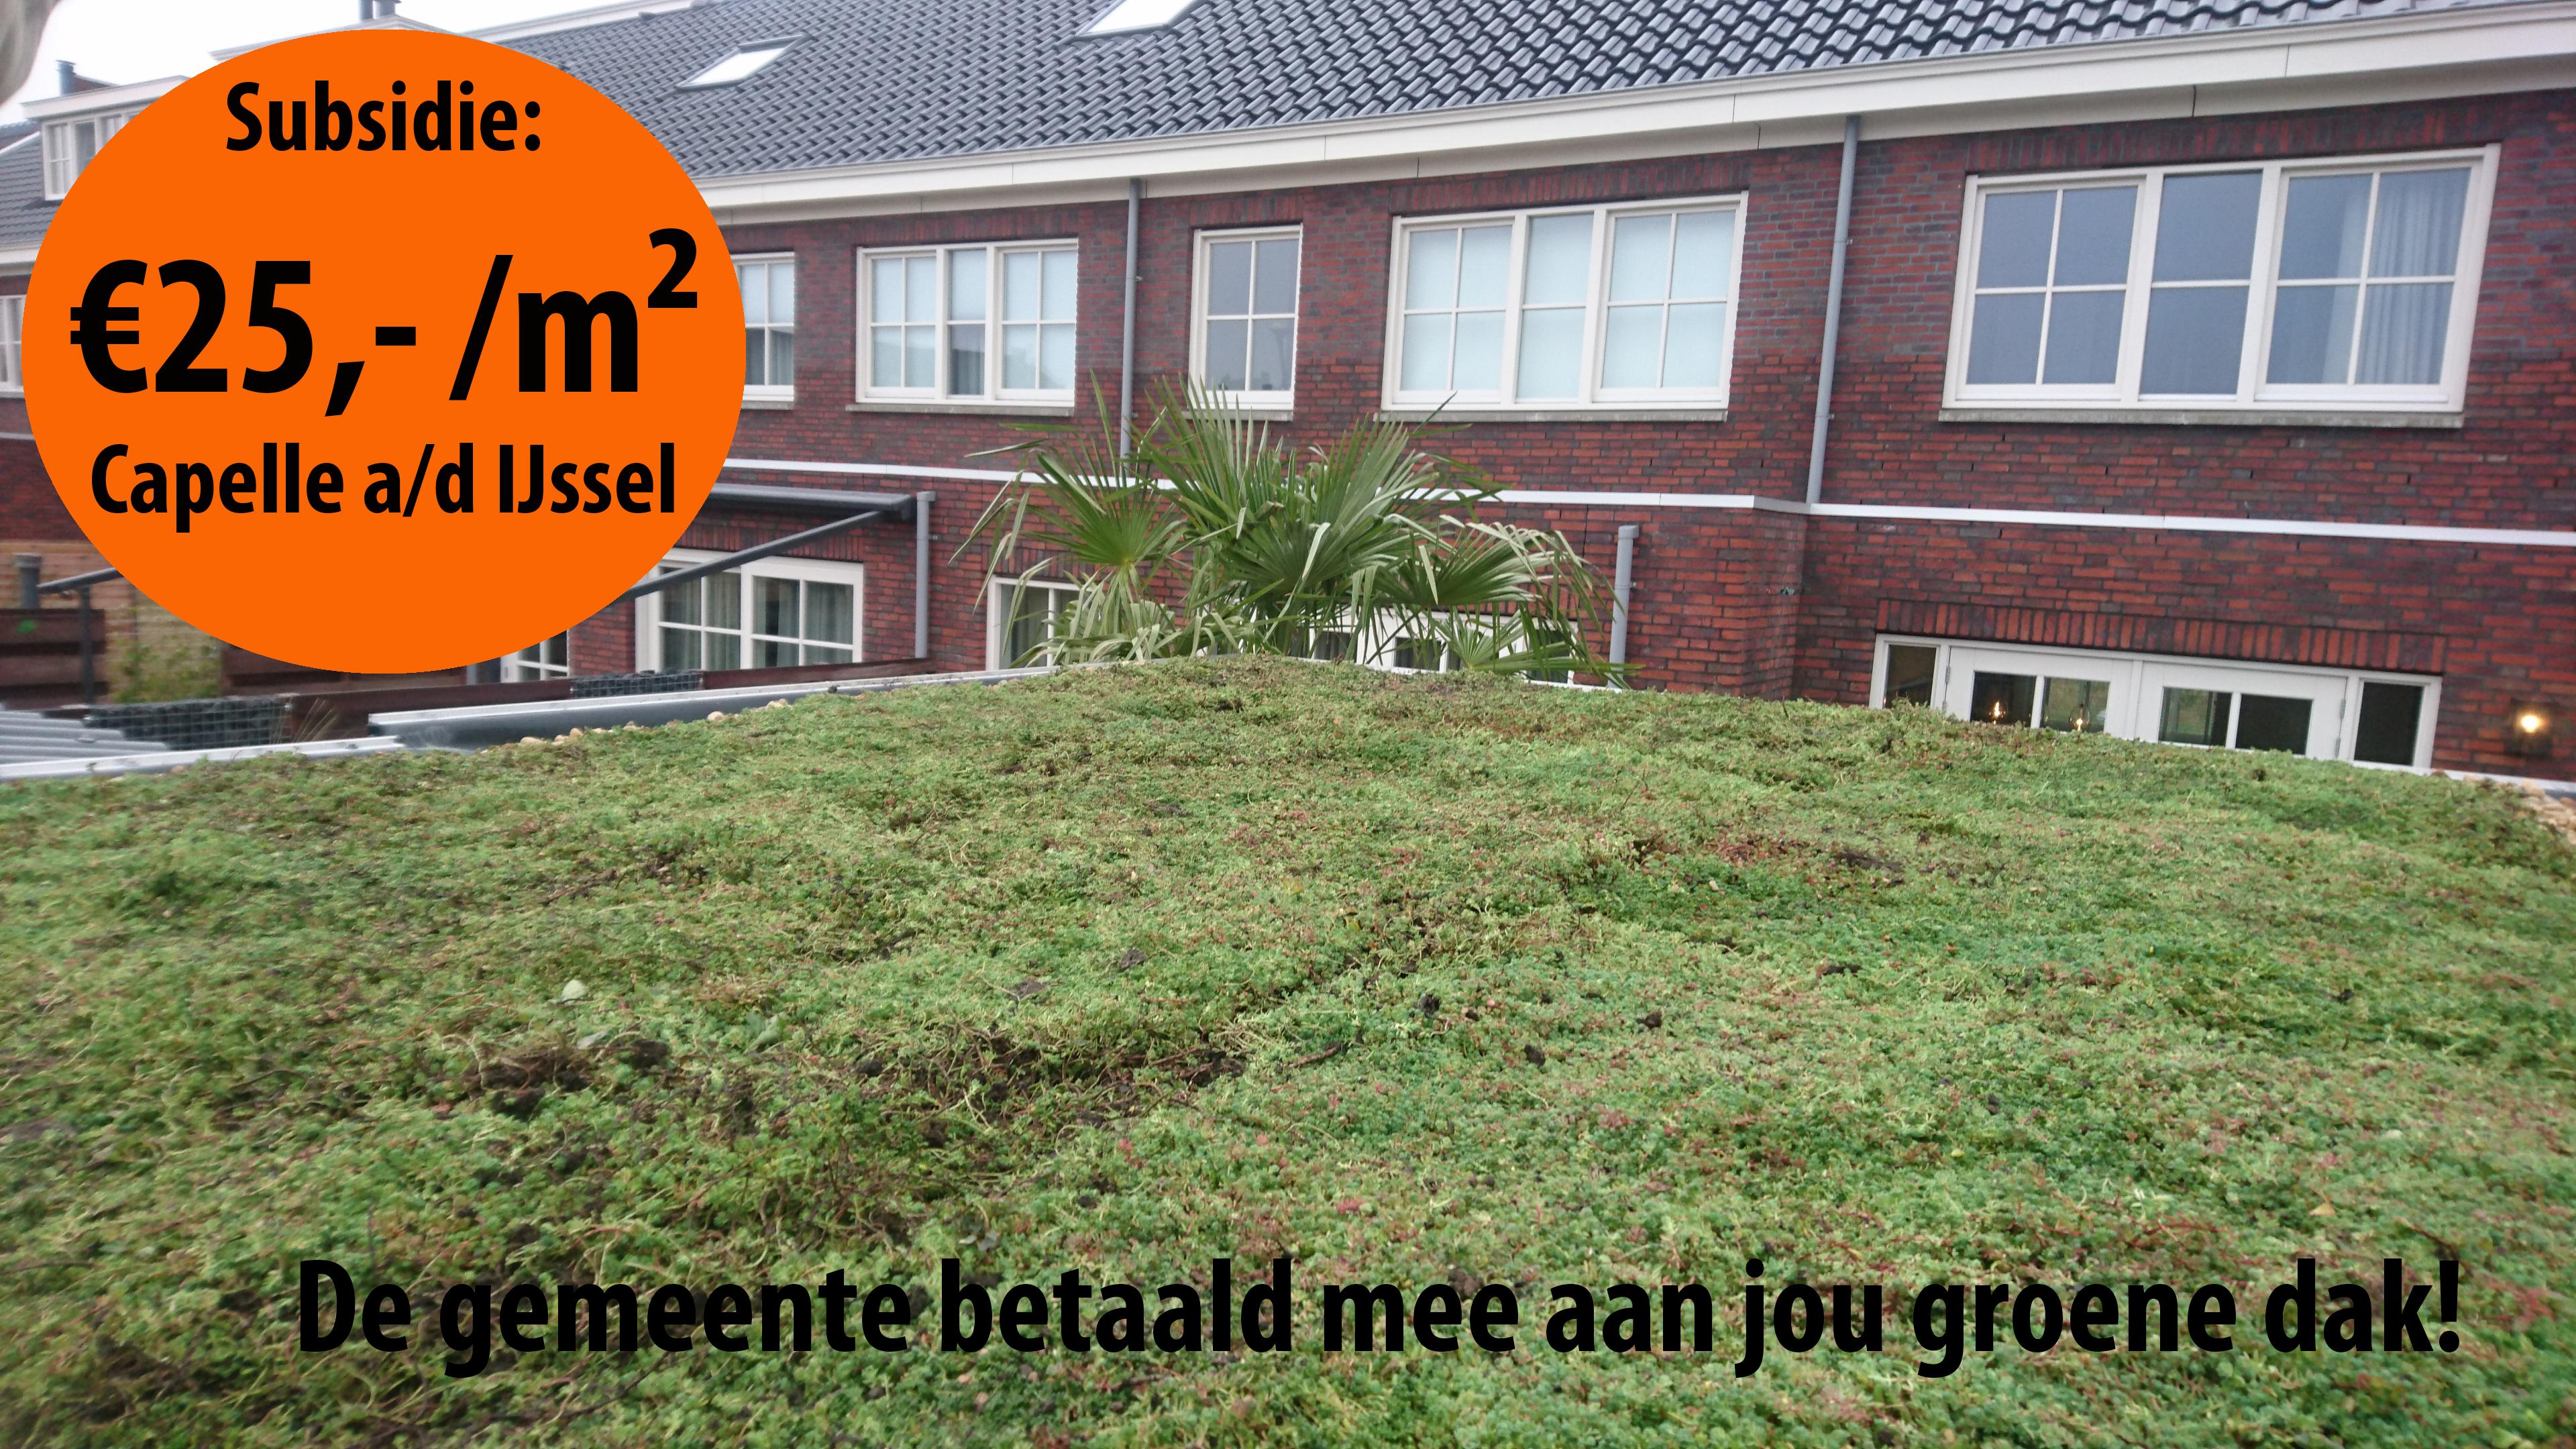 Subsidie sedumdak Capelle aan den IJssel (2017)